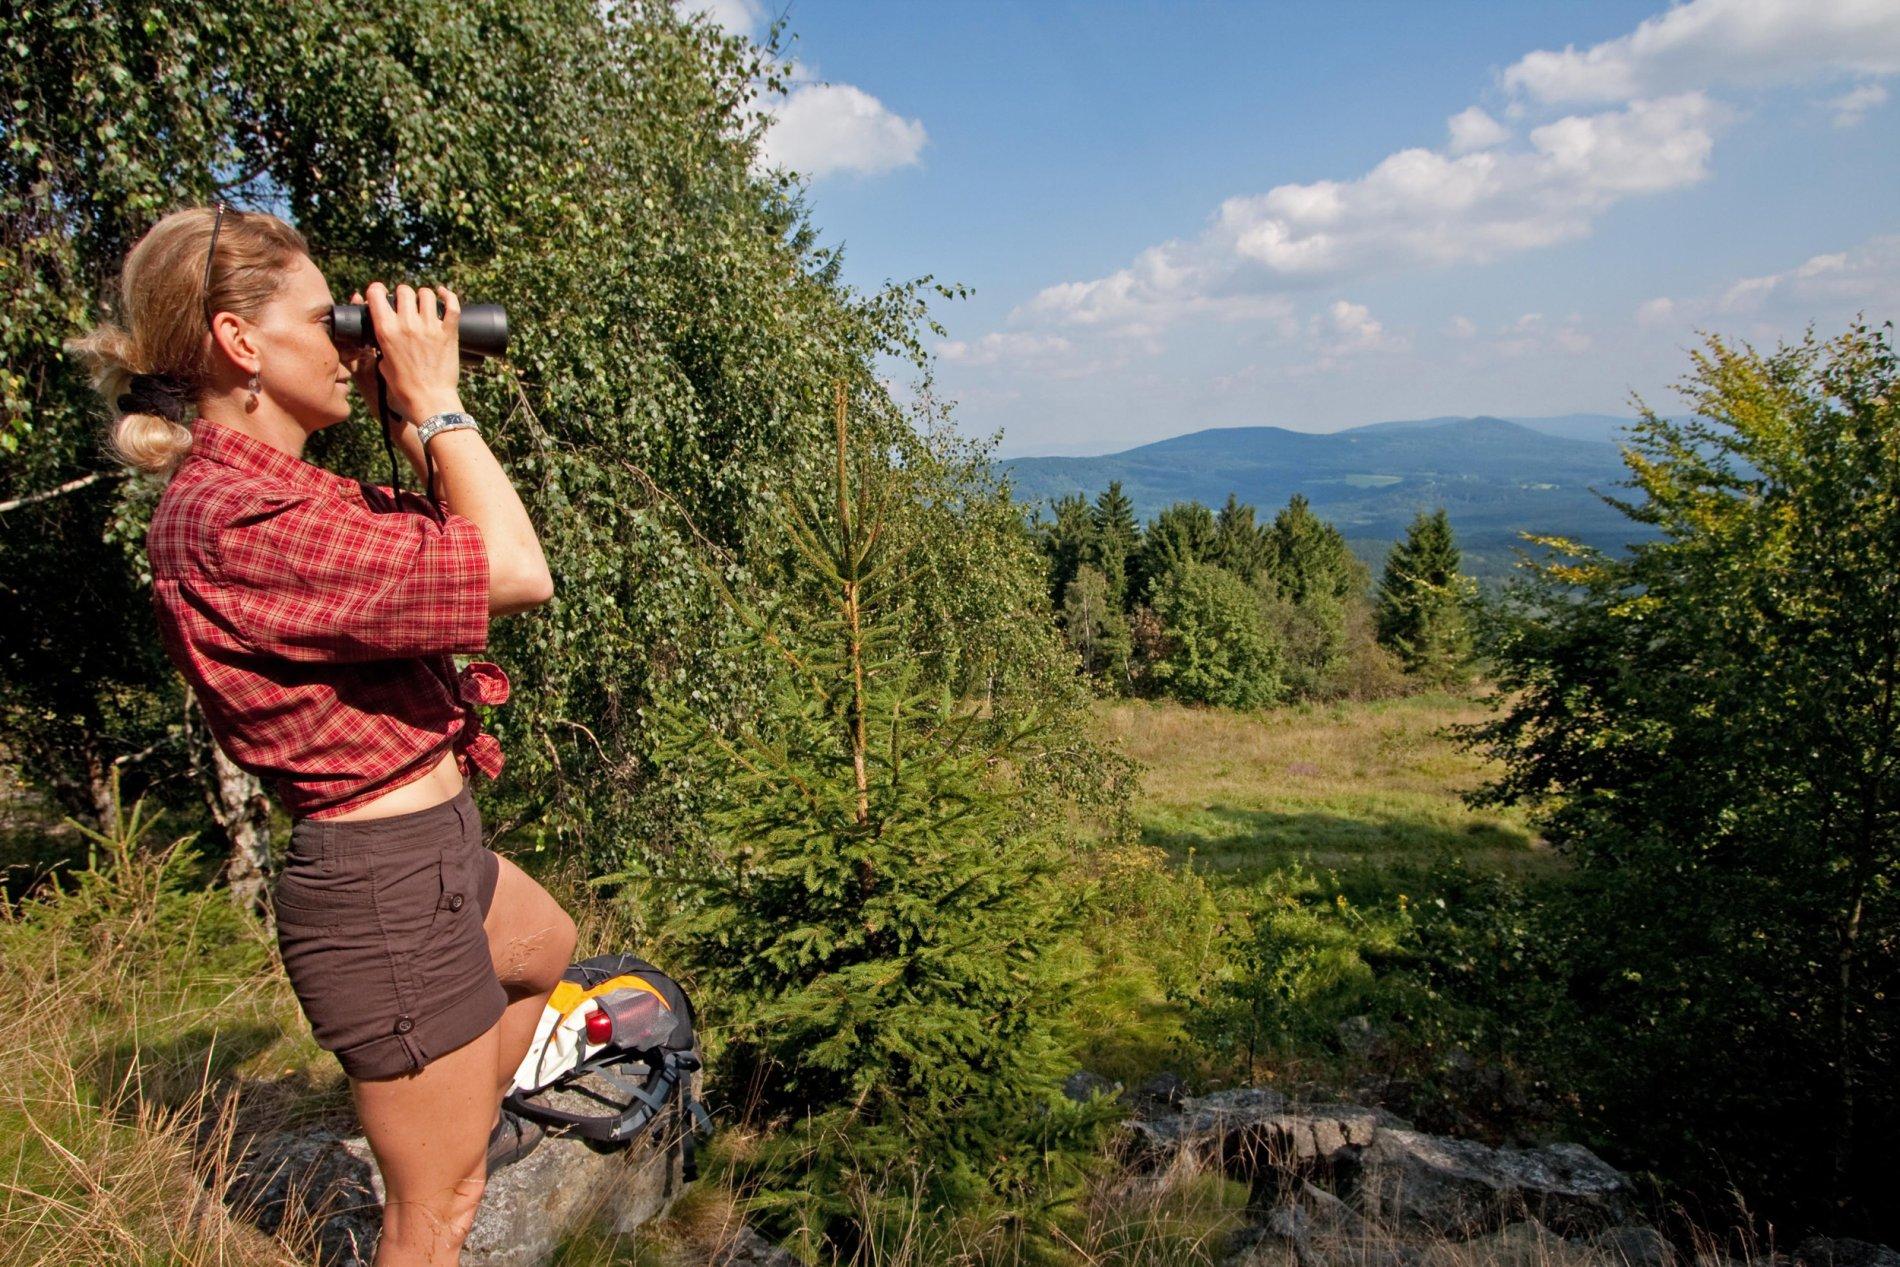 Oberpfälzer Wald Ausblick bei Stadlern